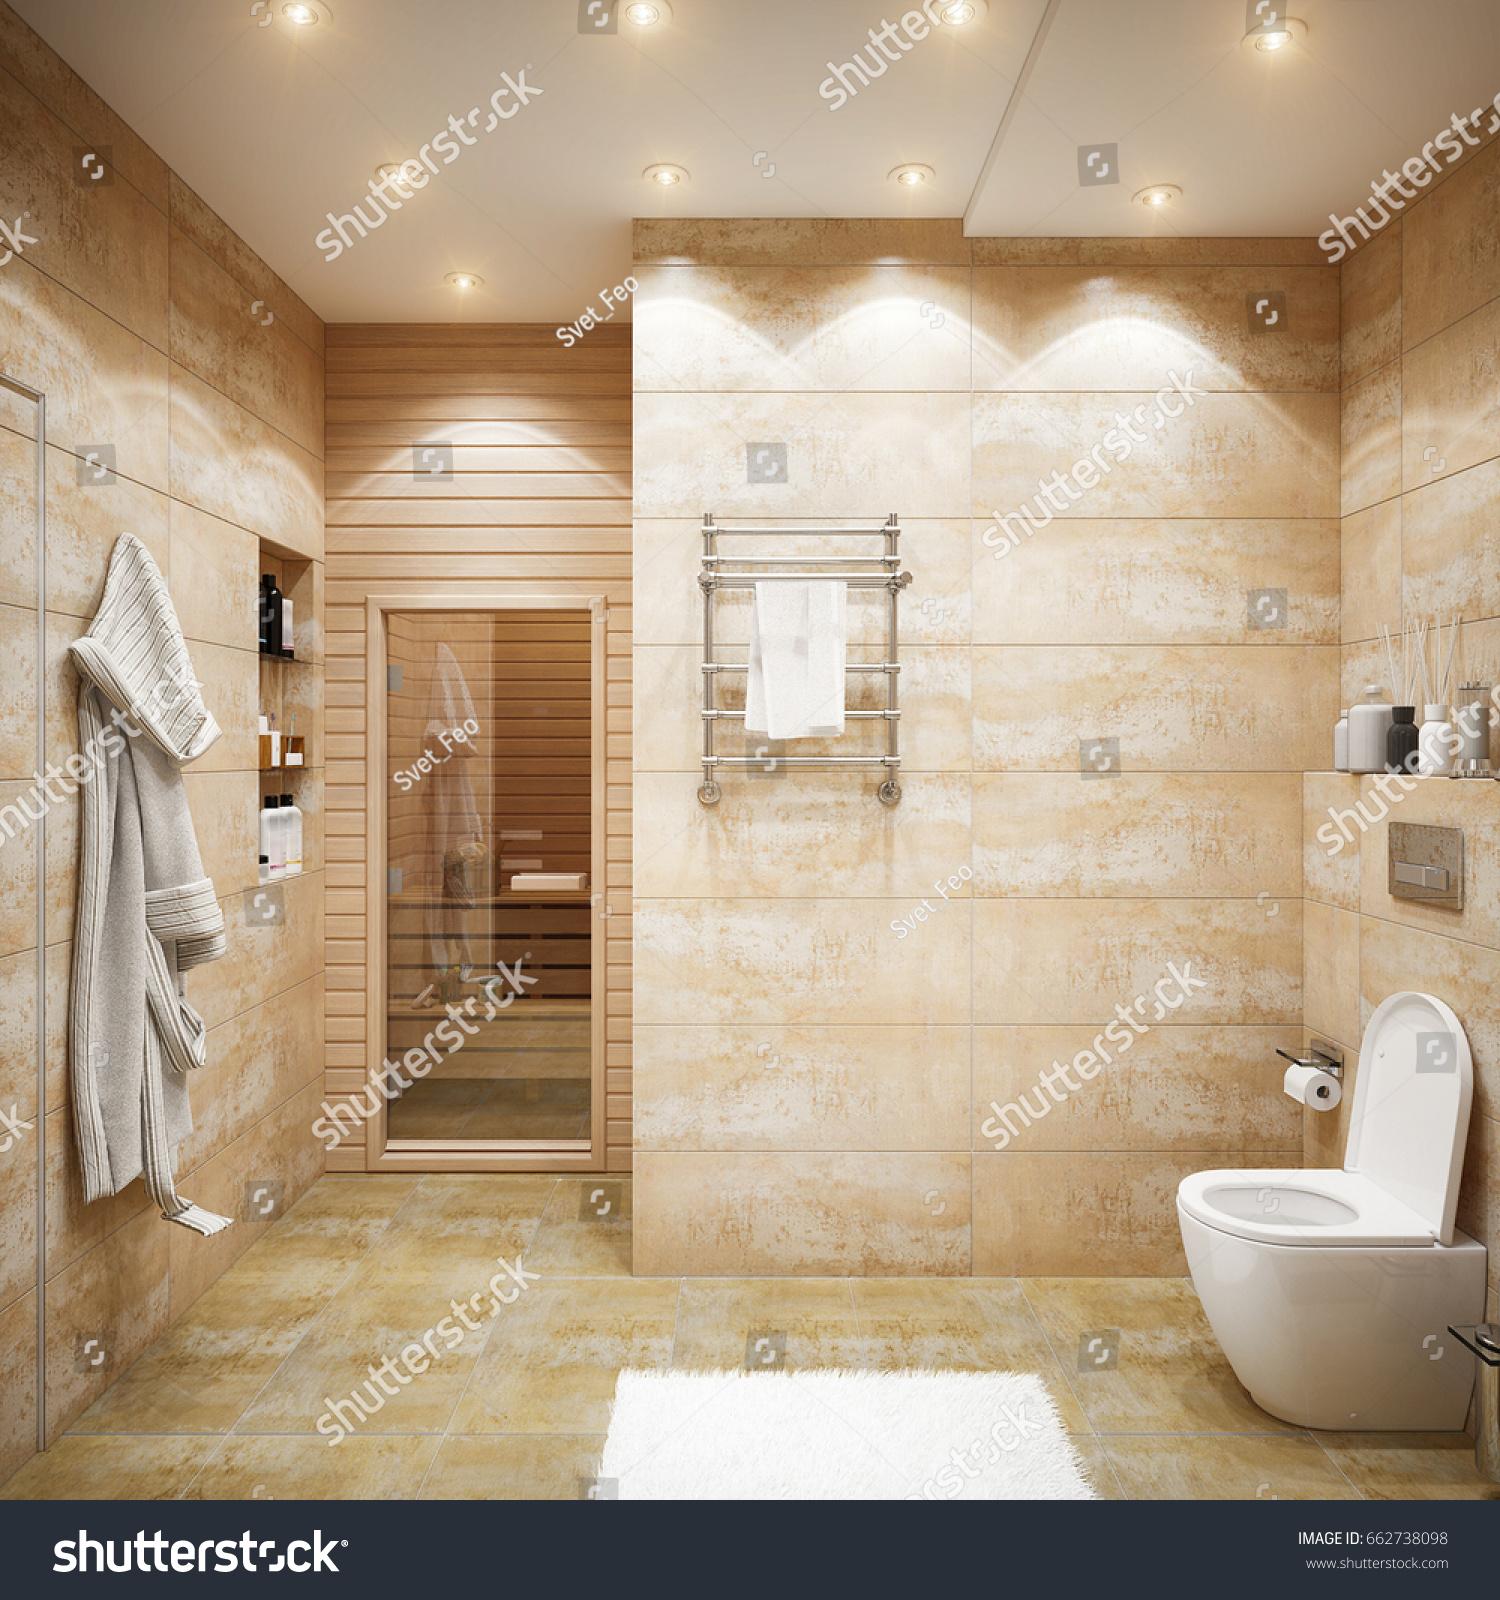 Image of: Modern Urban Contemporary Bathroom Interior Design Stock Illustration 662738098